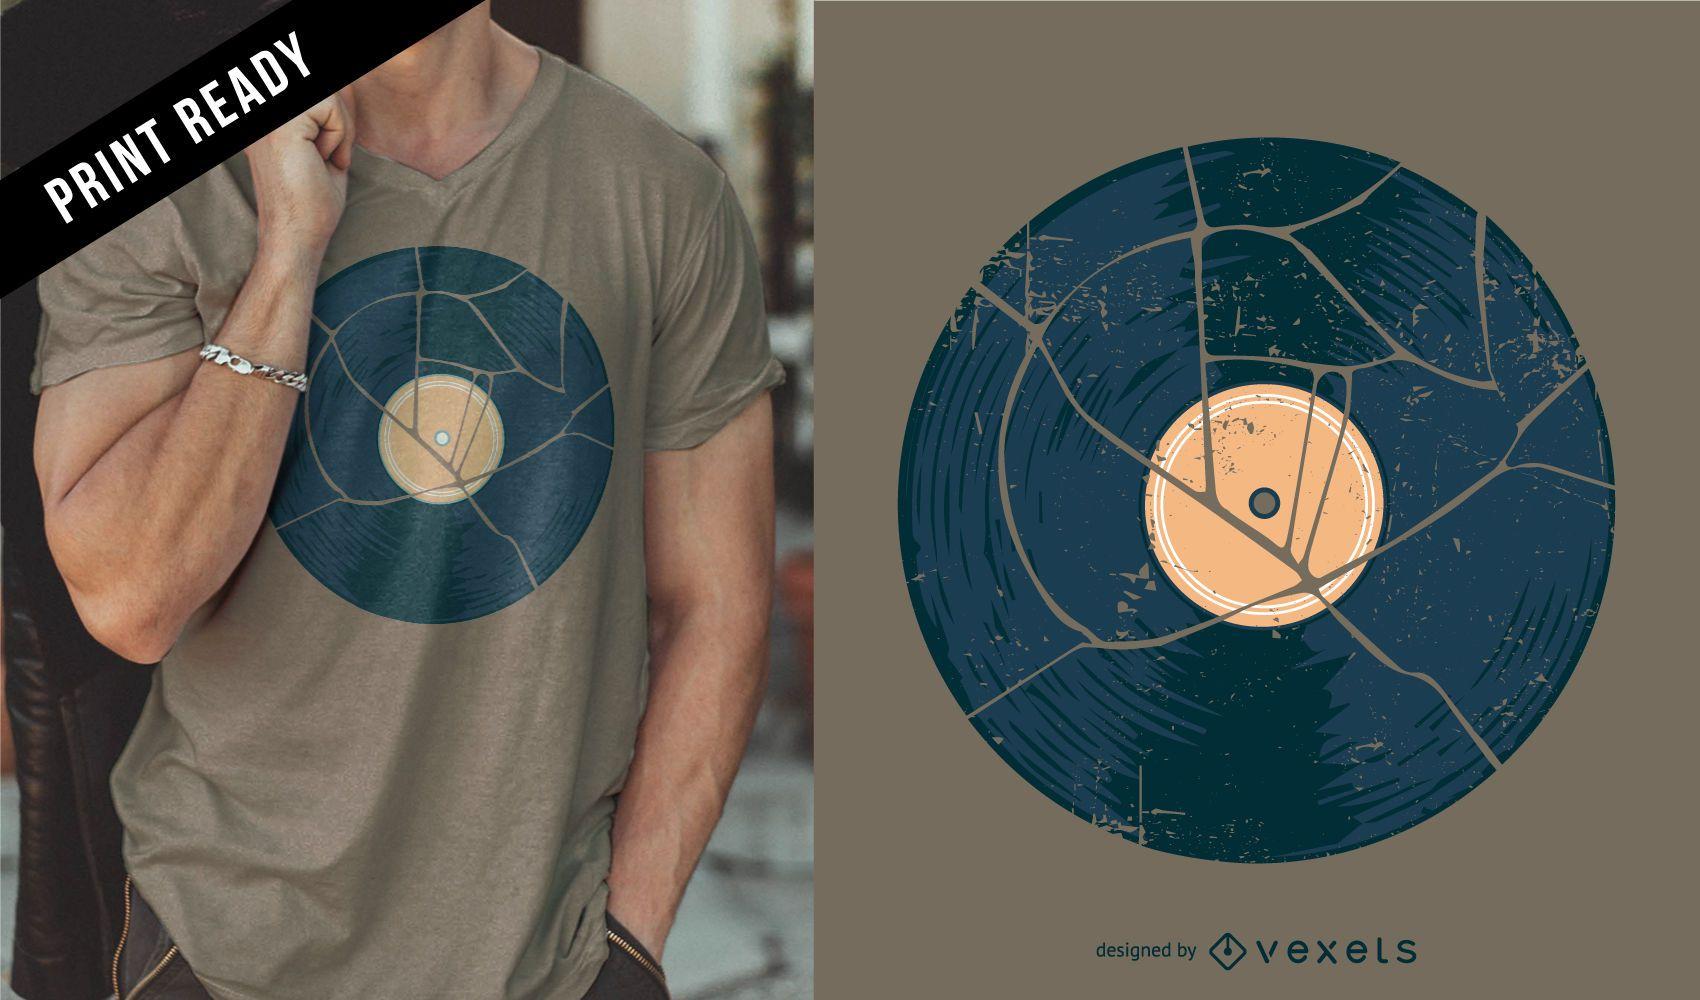 Broken vinyl t-shirt design